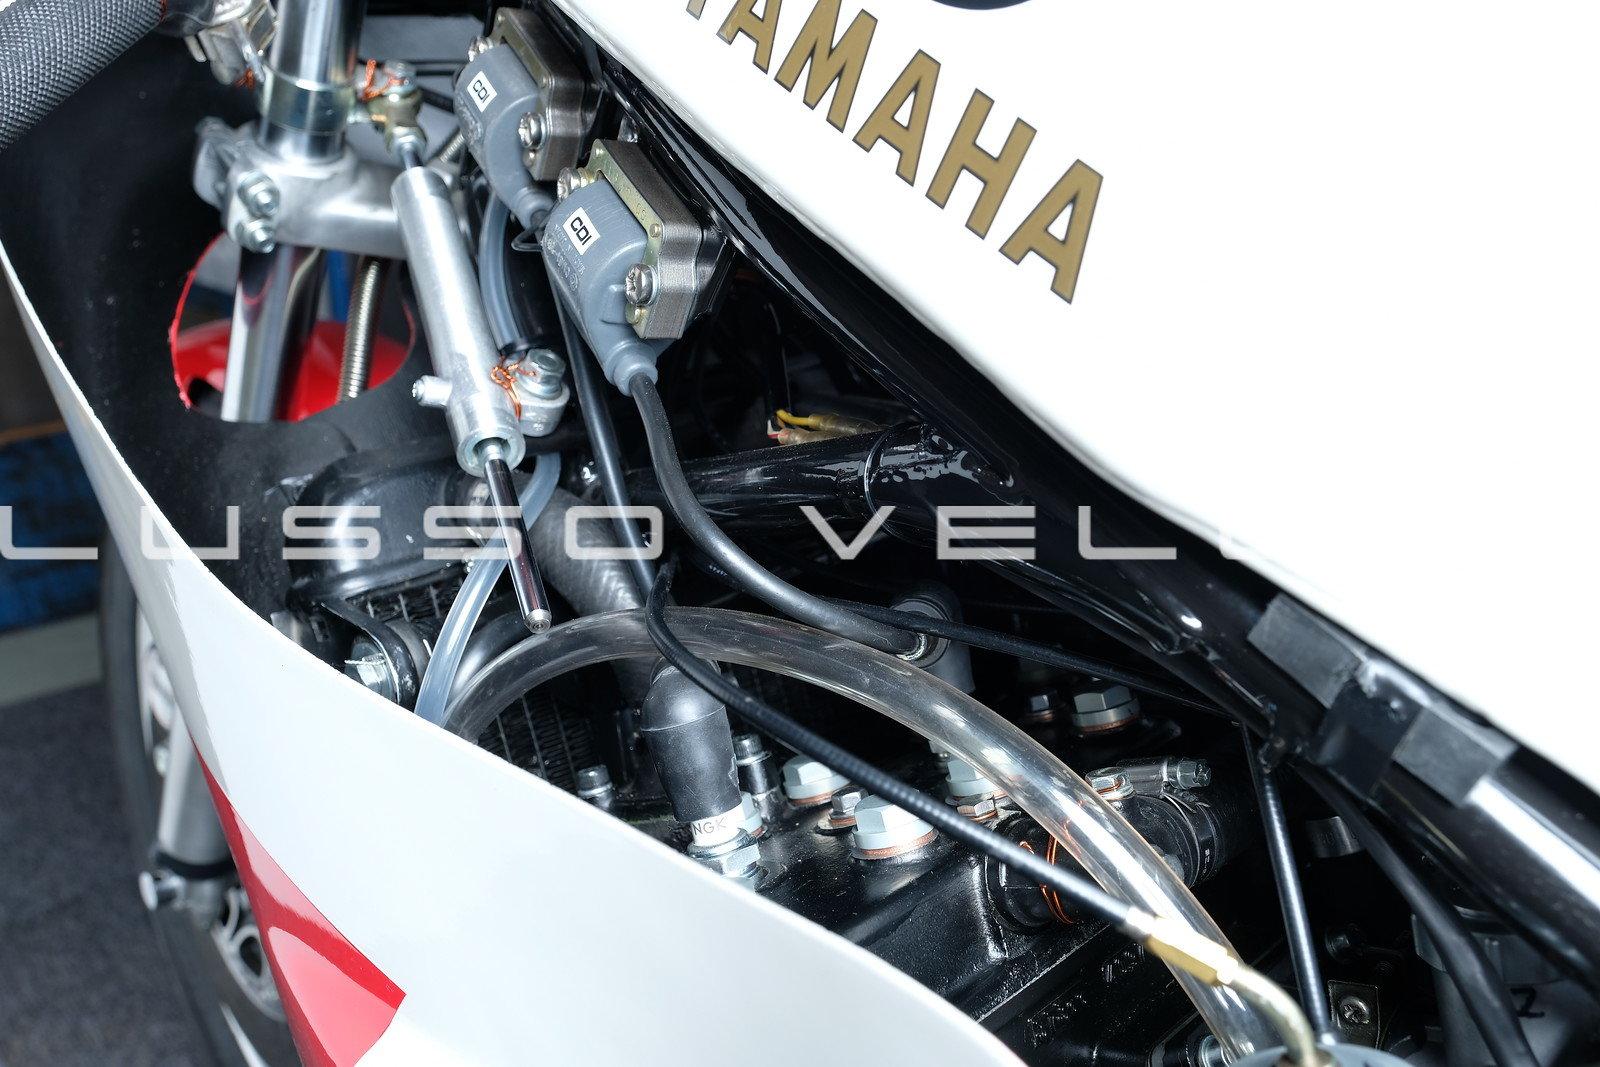 1975 Yamaha TZ 750 C GP Race bike For Sale (picture 3 of 6)